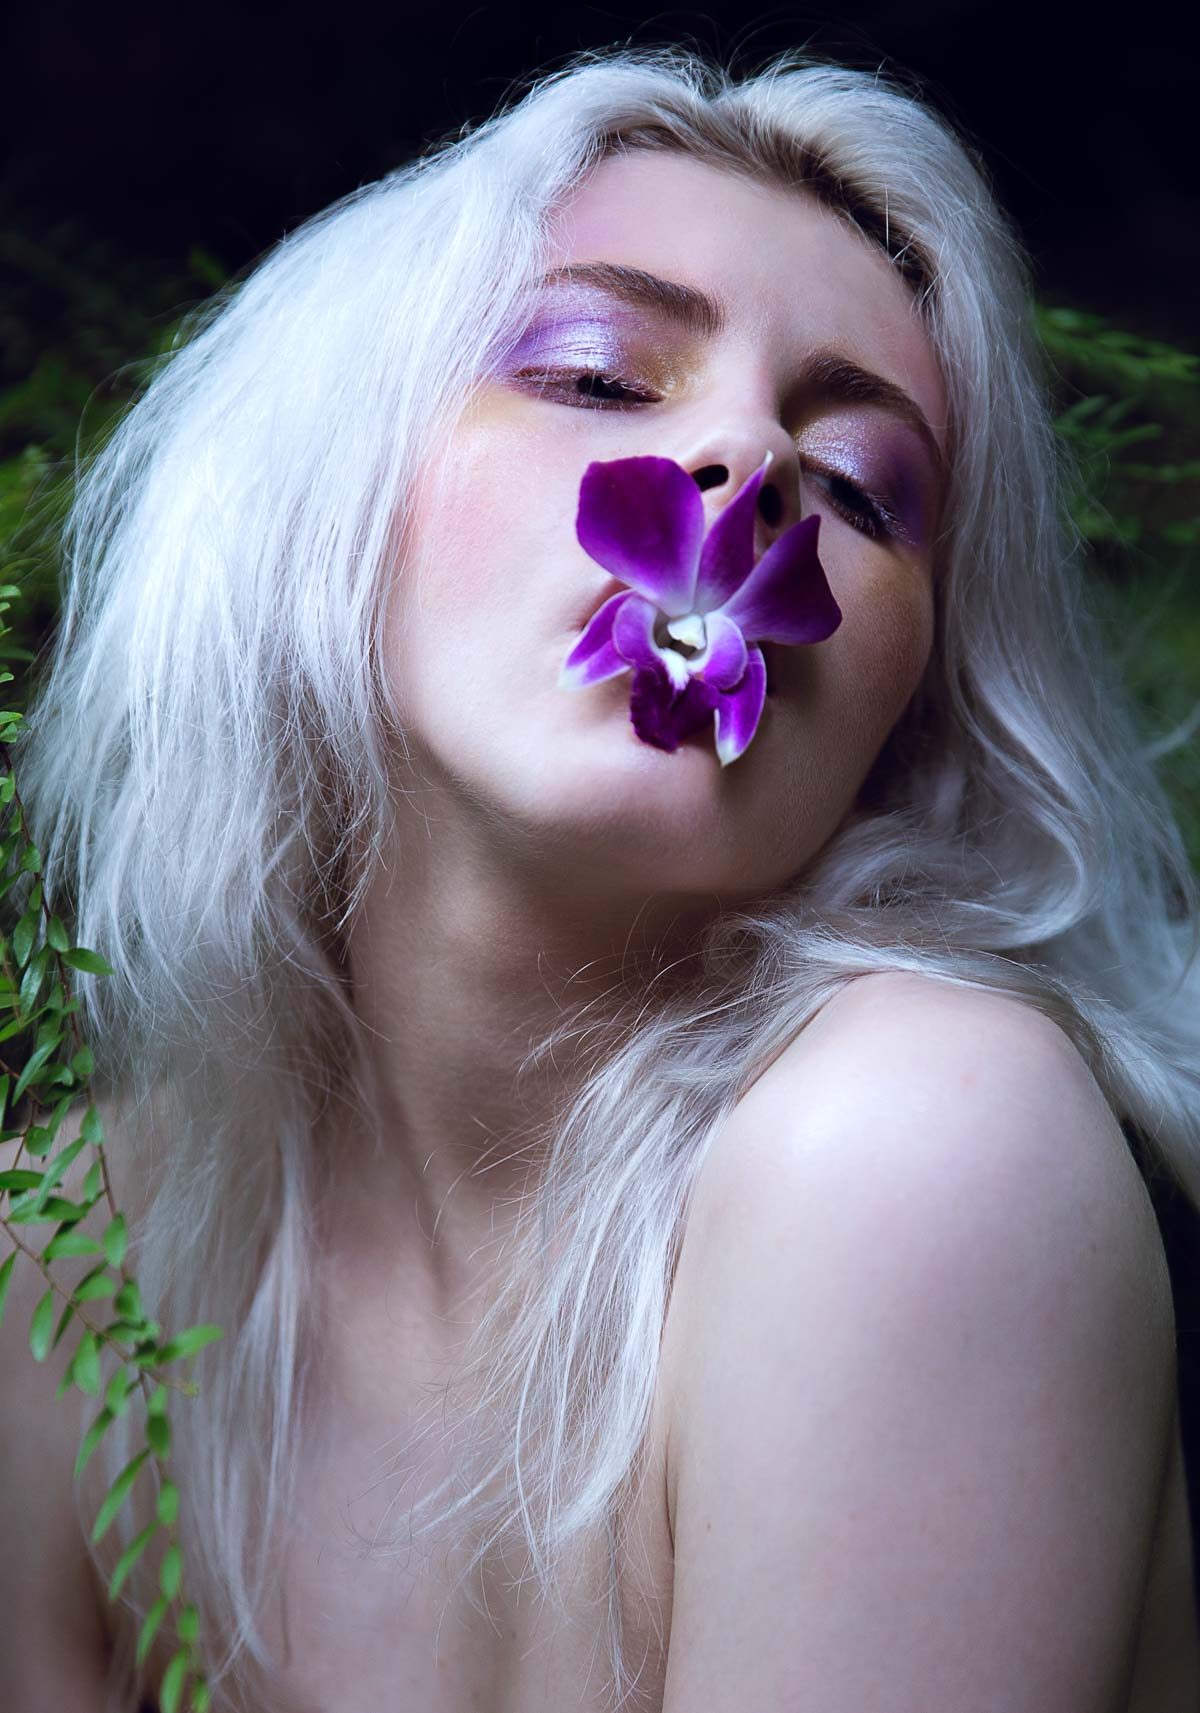 the_forest_magazine_amberly_valentine-neve-angie_angorro_0011